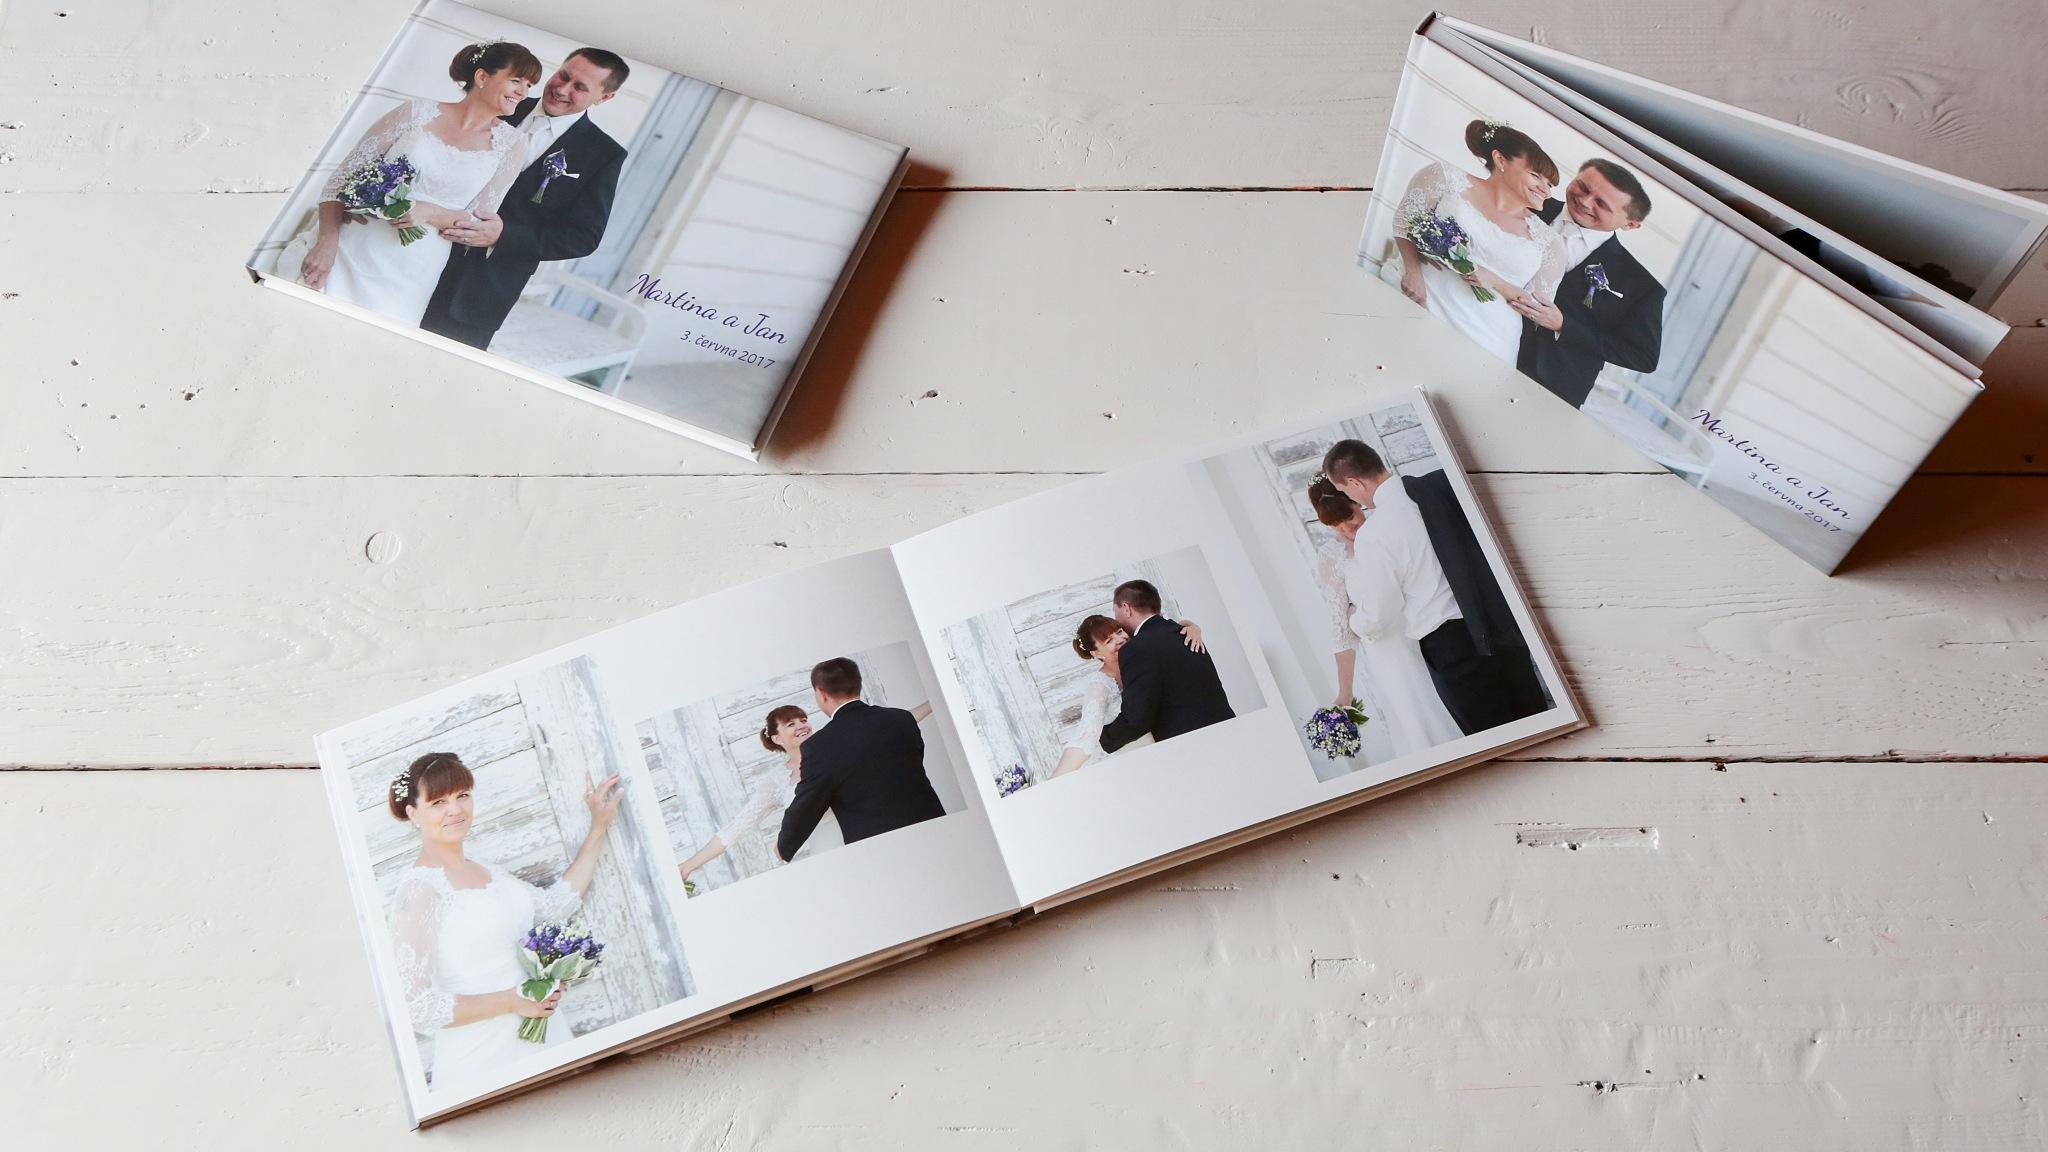 svatební fotokniha lepeska fotograf